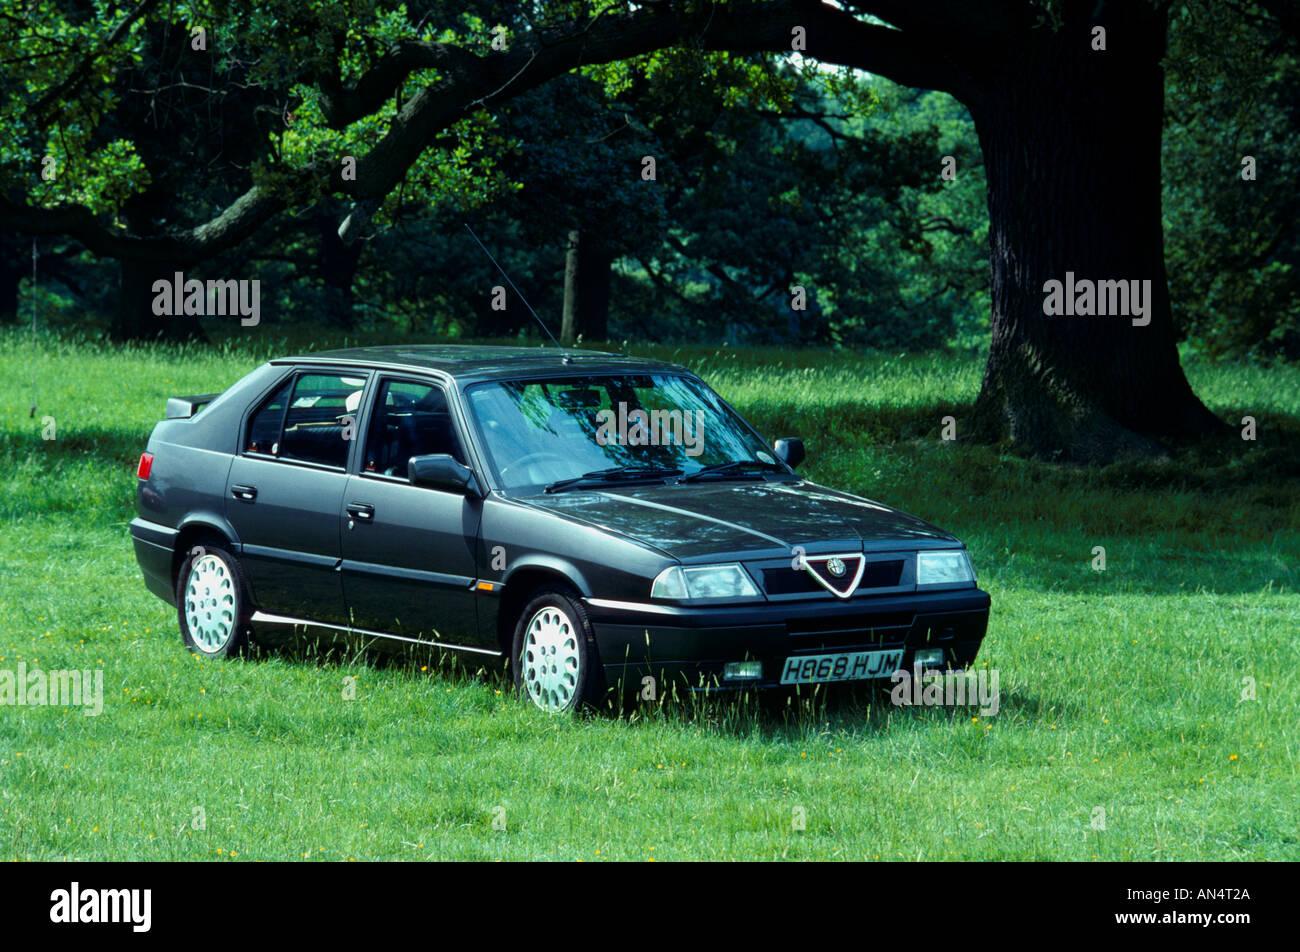 Alfa Romeo 33 16v Boxer Cloverleaf Stock Photo Alamy